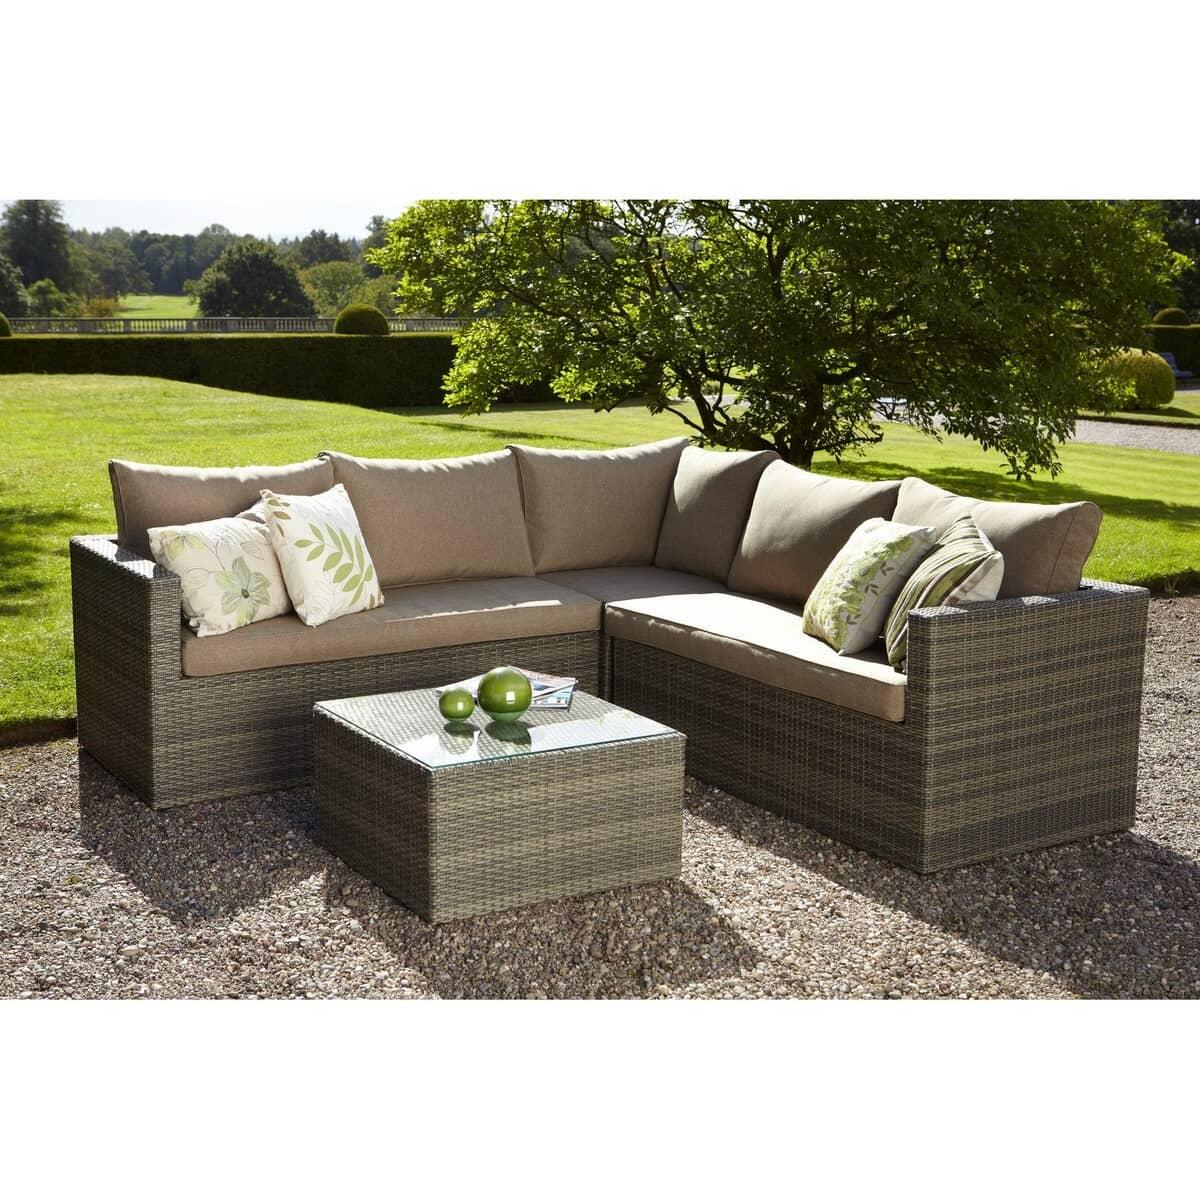 World Of Furniture: Hartman Bentley Modular Set